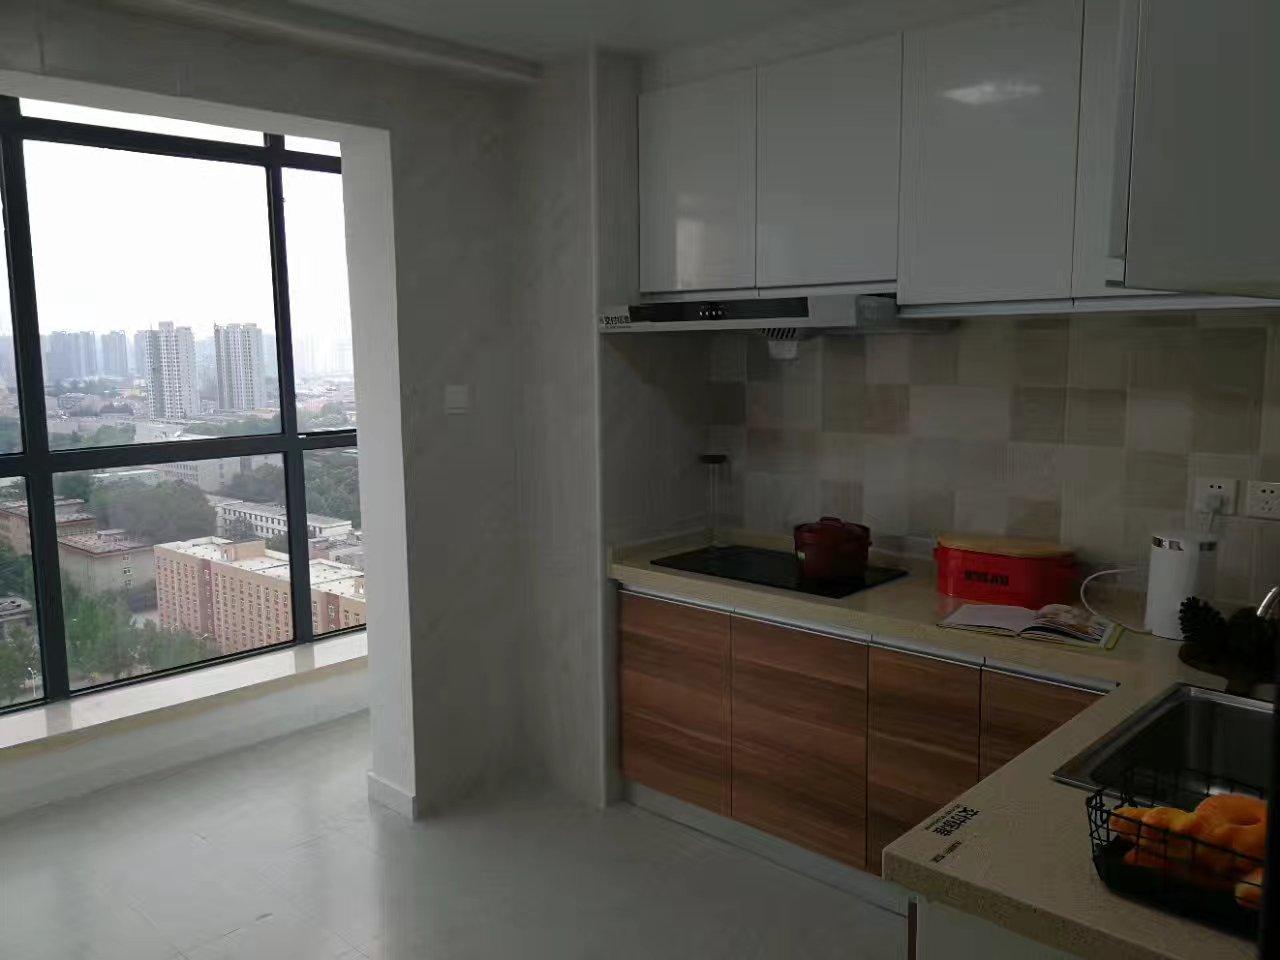 L型橱柜让烹饪操作流畅便捷,厨房阳台不仅增加了光线,还多了收纳空间。